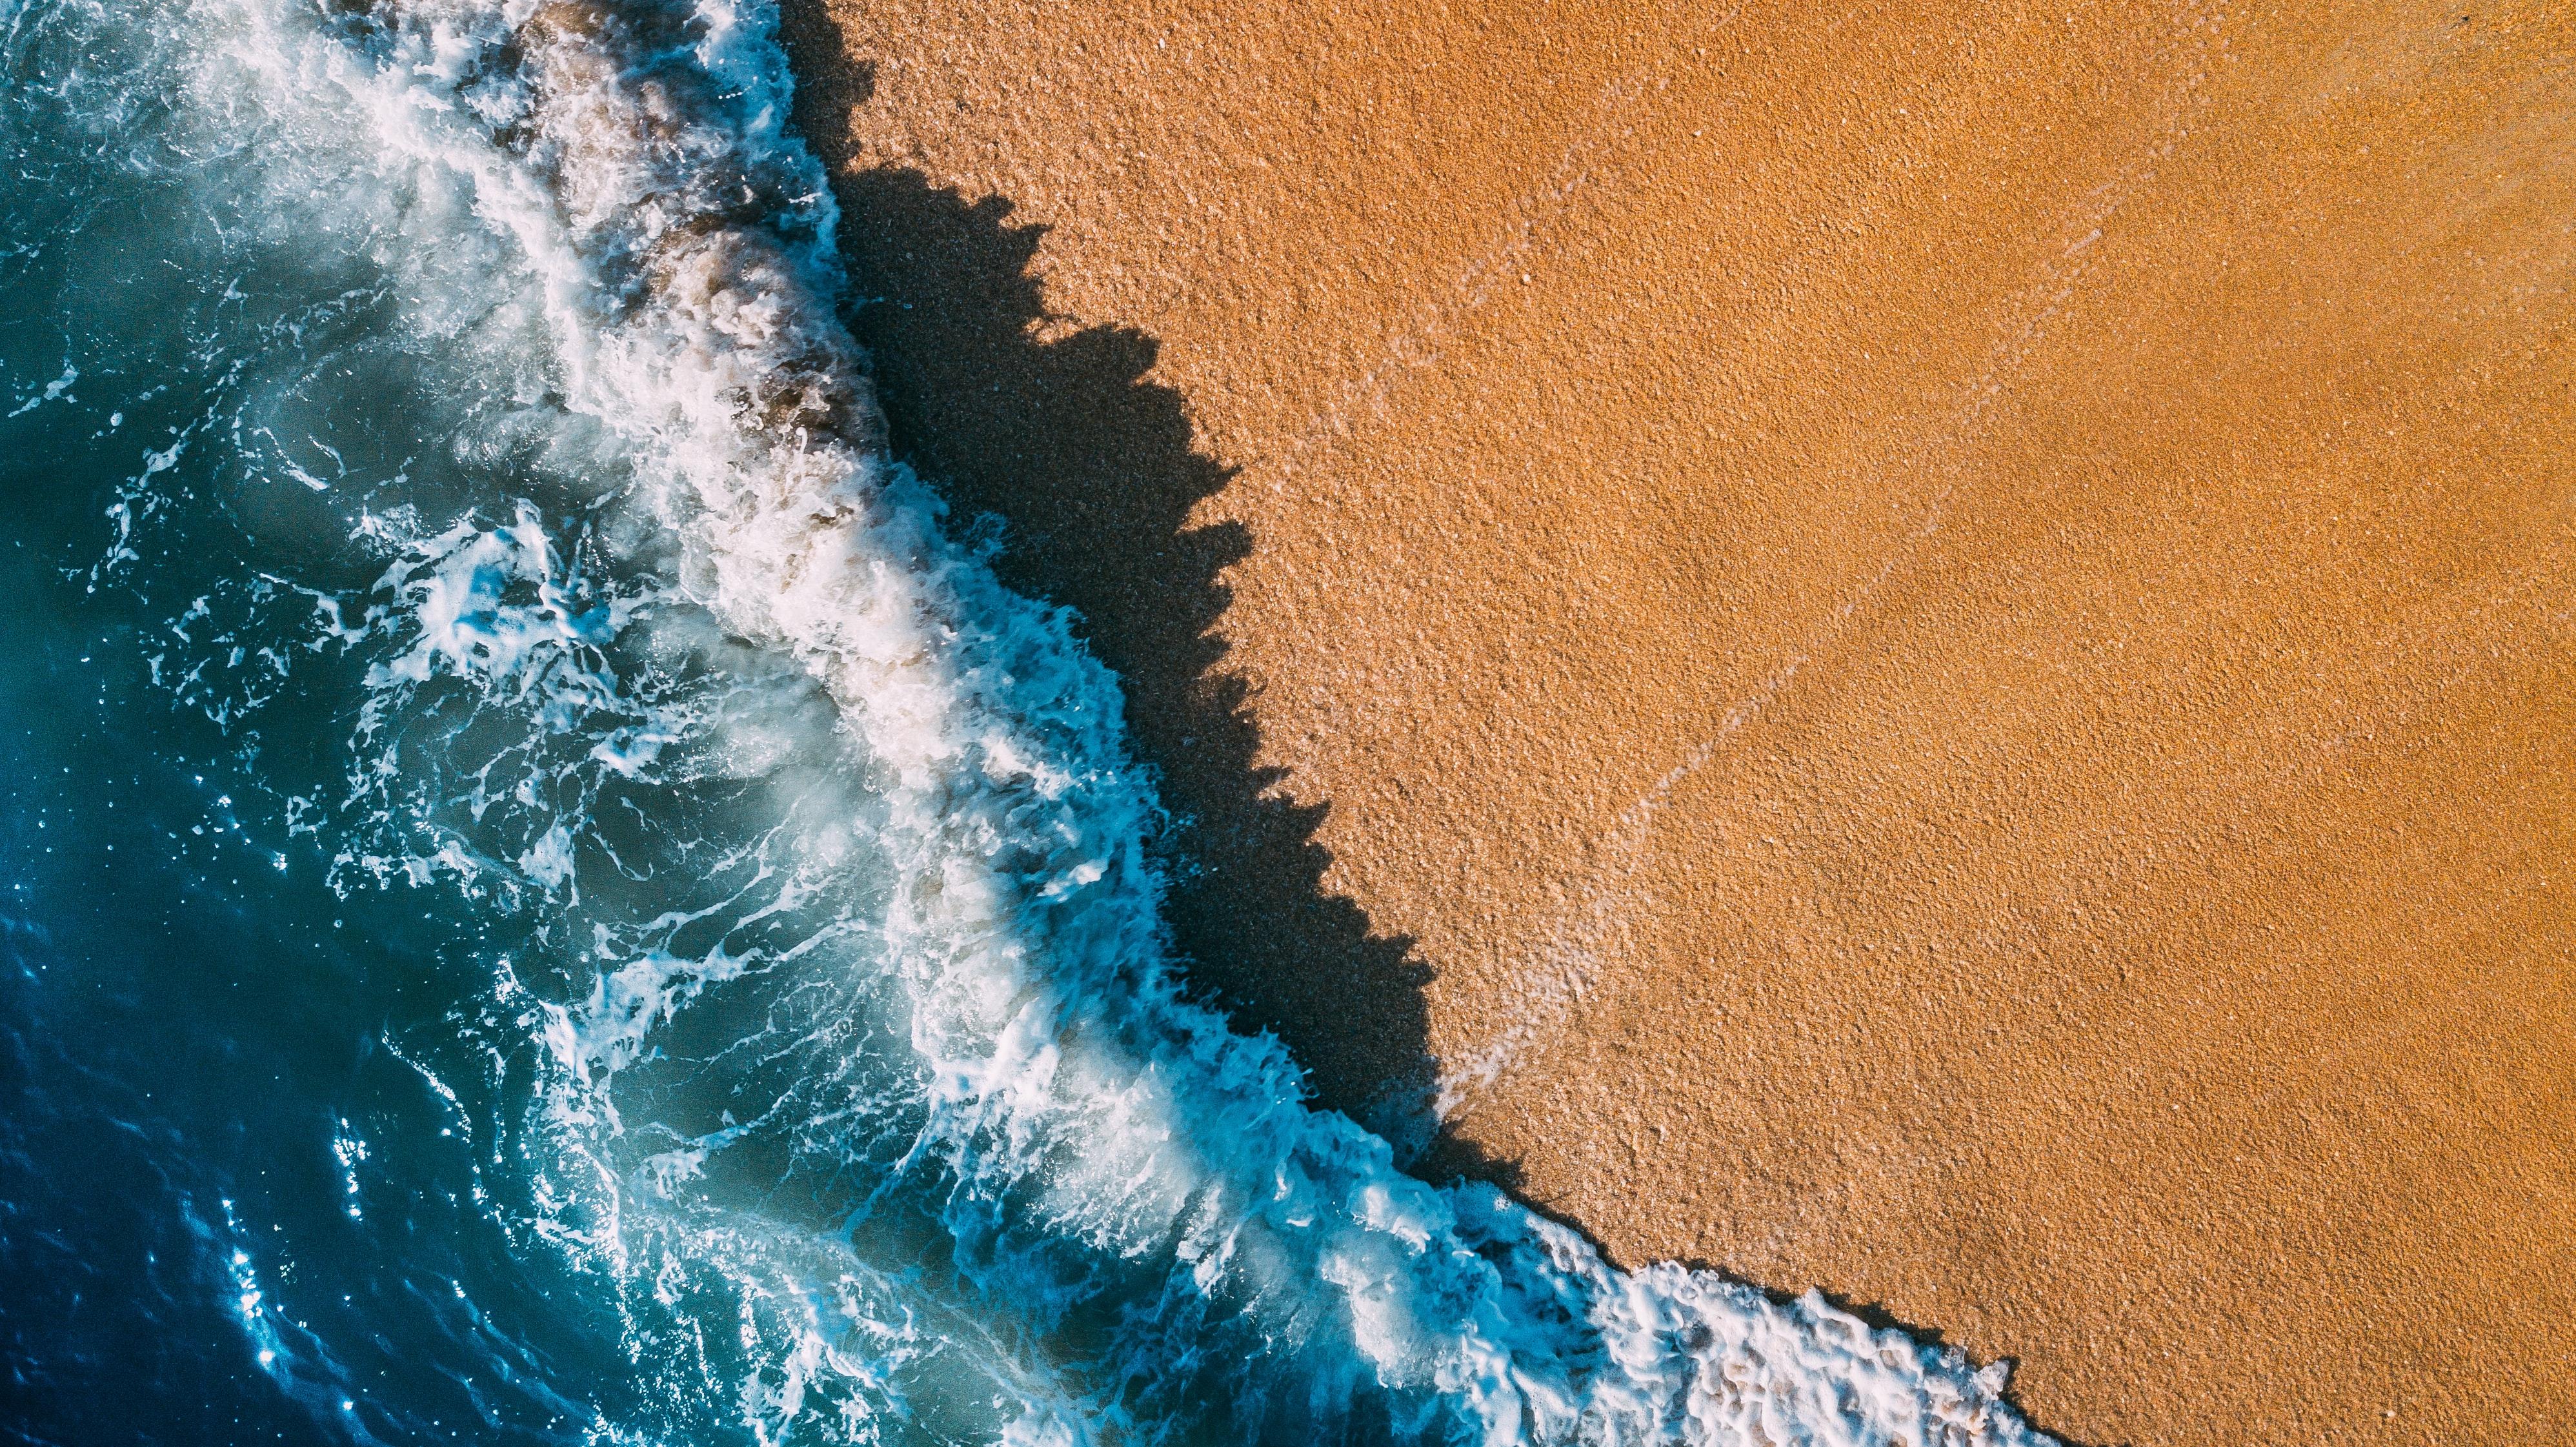 General 3992x2242 nature beach sand water